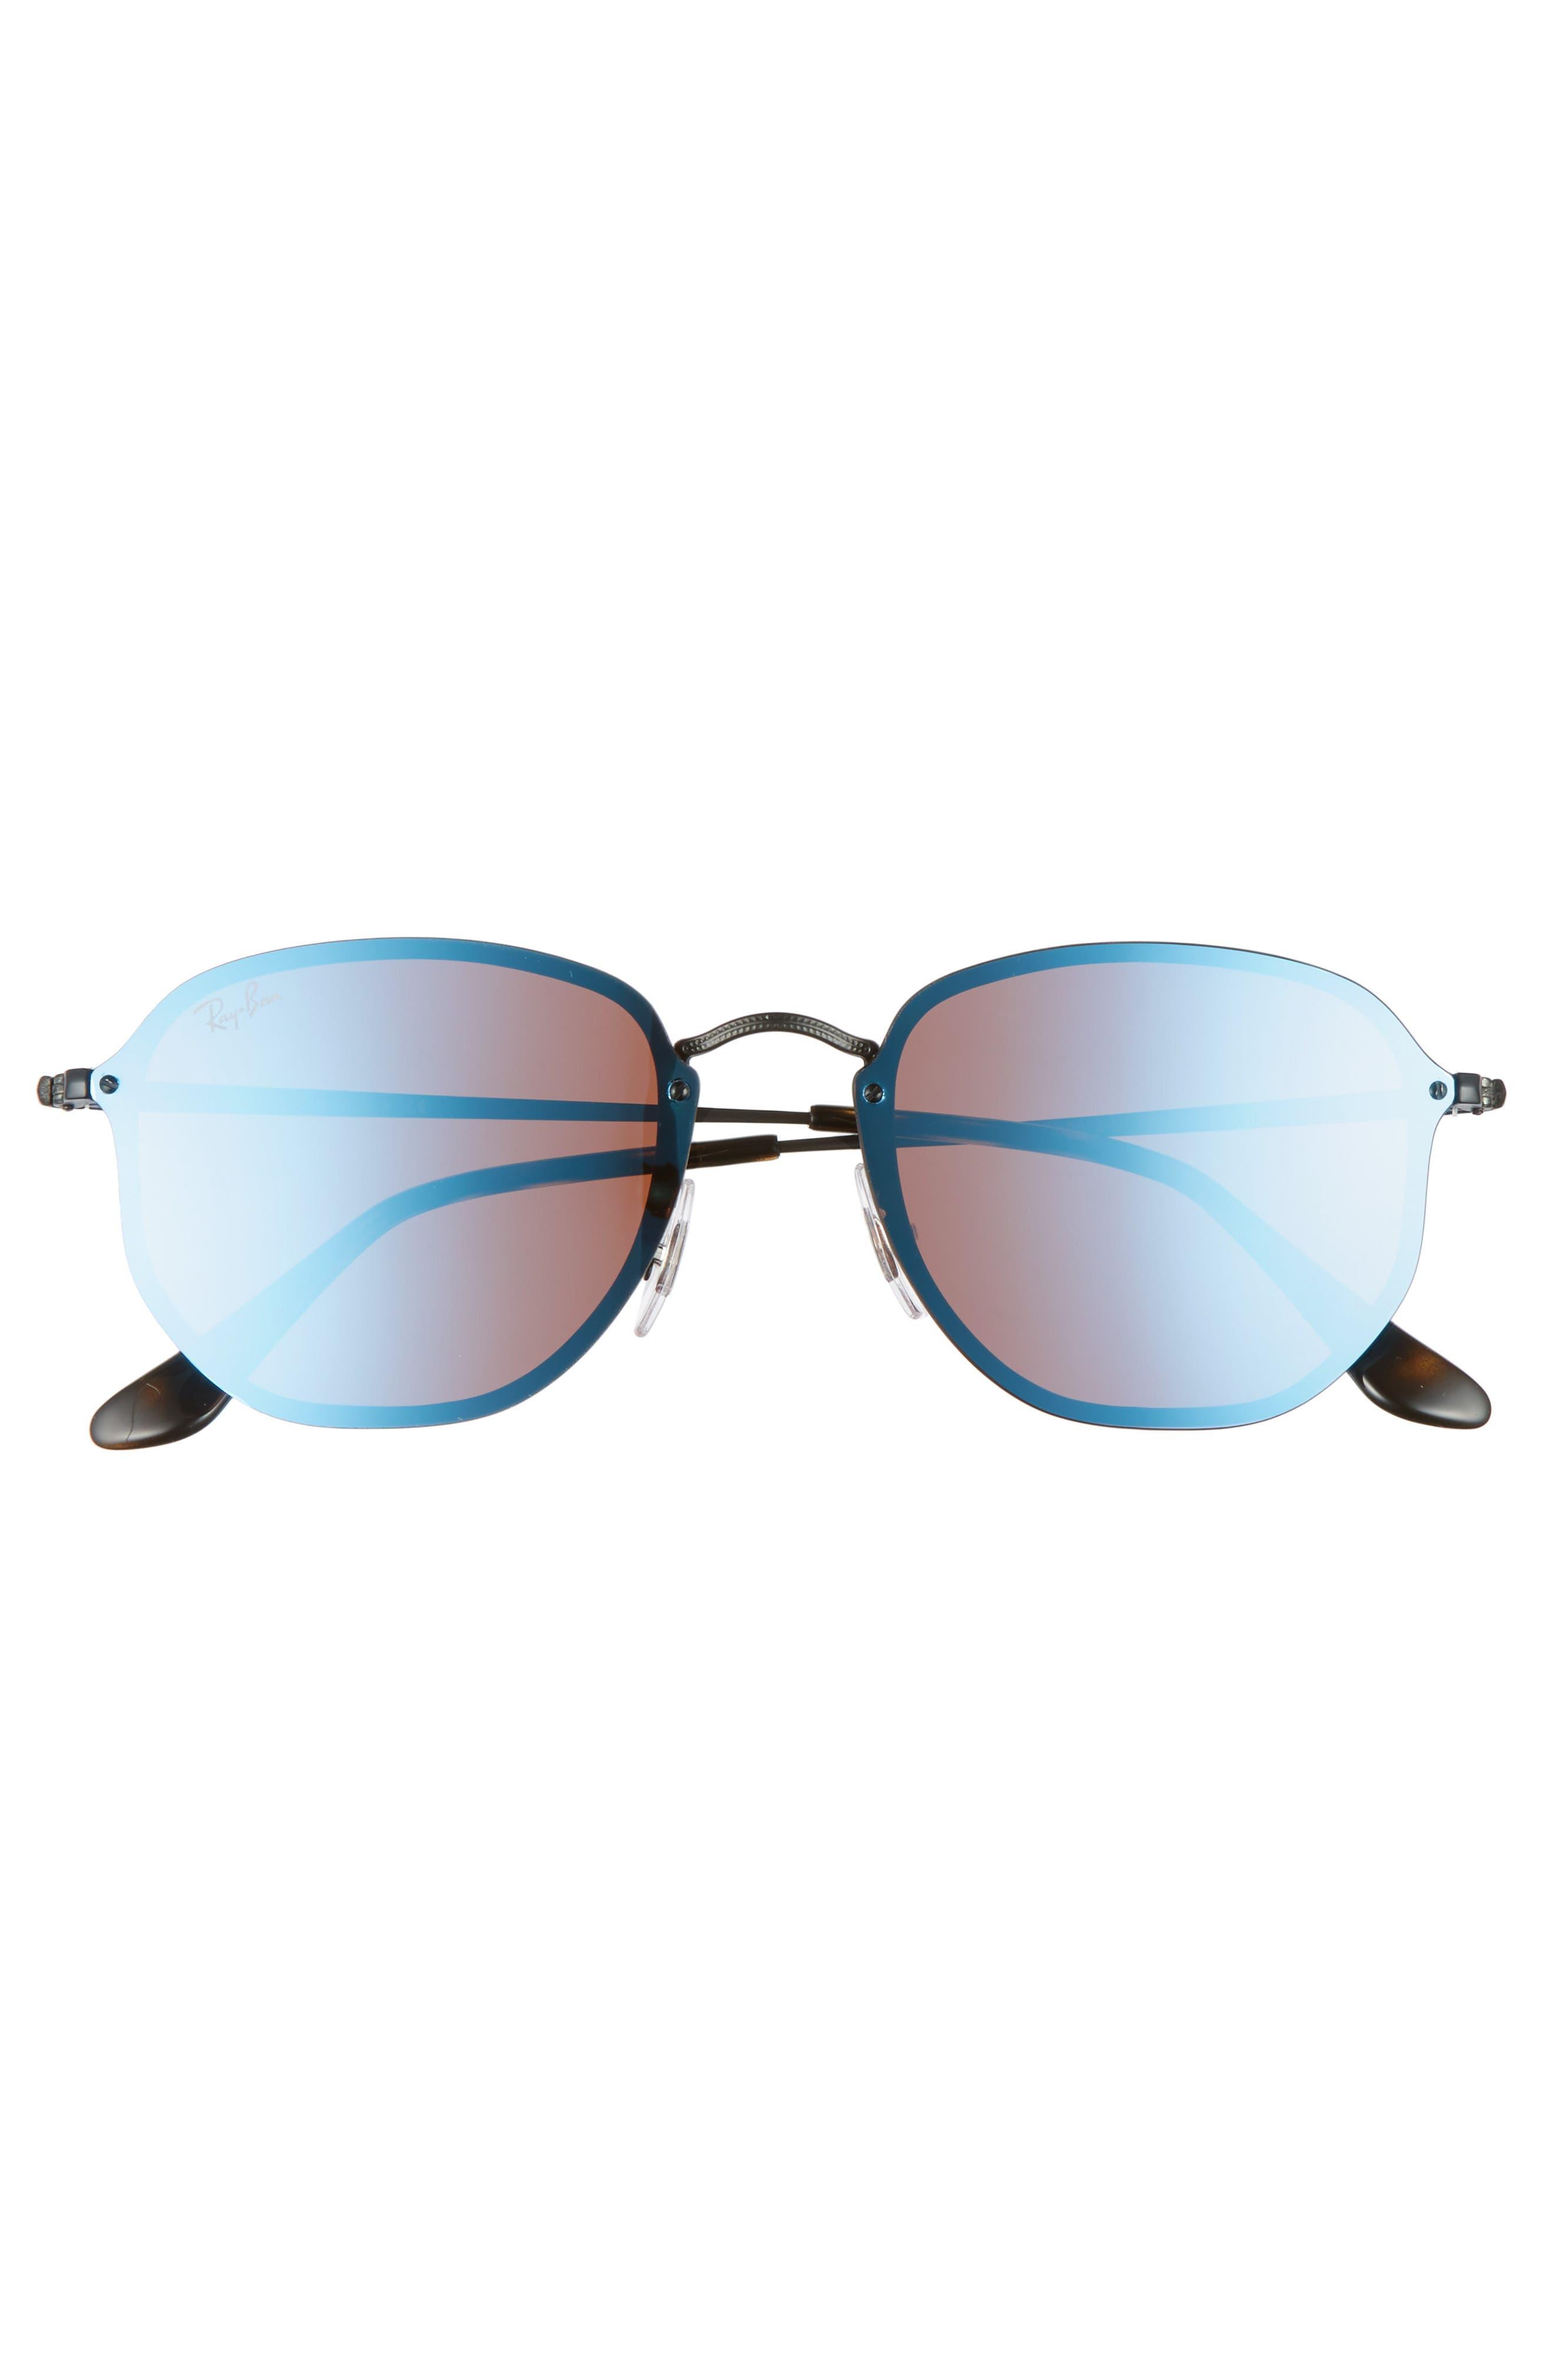 58mm Round Sunglasses,                             Alternate thumbnail 4, color,                             Shiny Black